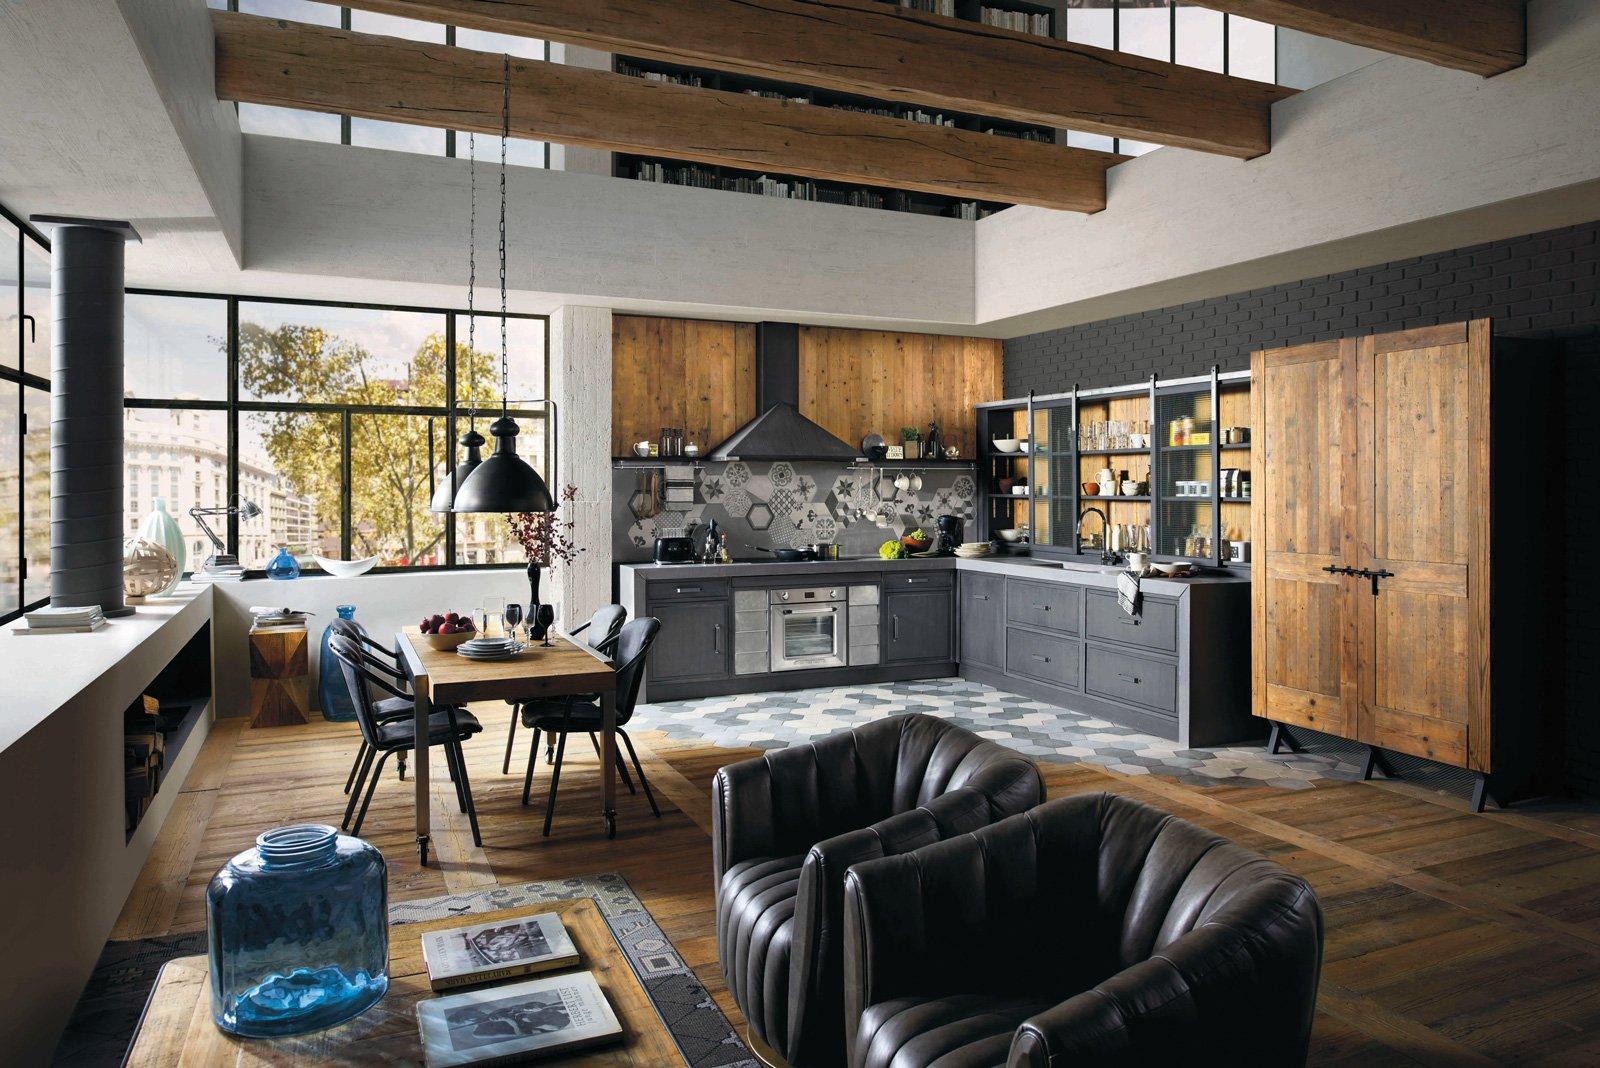 Cucine in stile industriale materiche e vissute cose di - Cucine marchi group ...